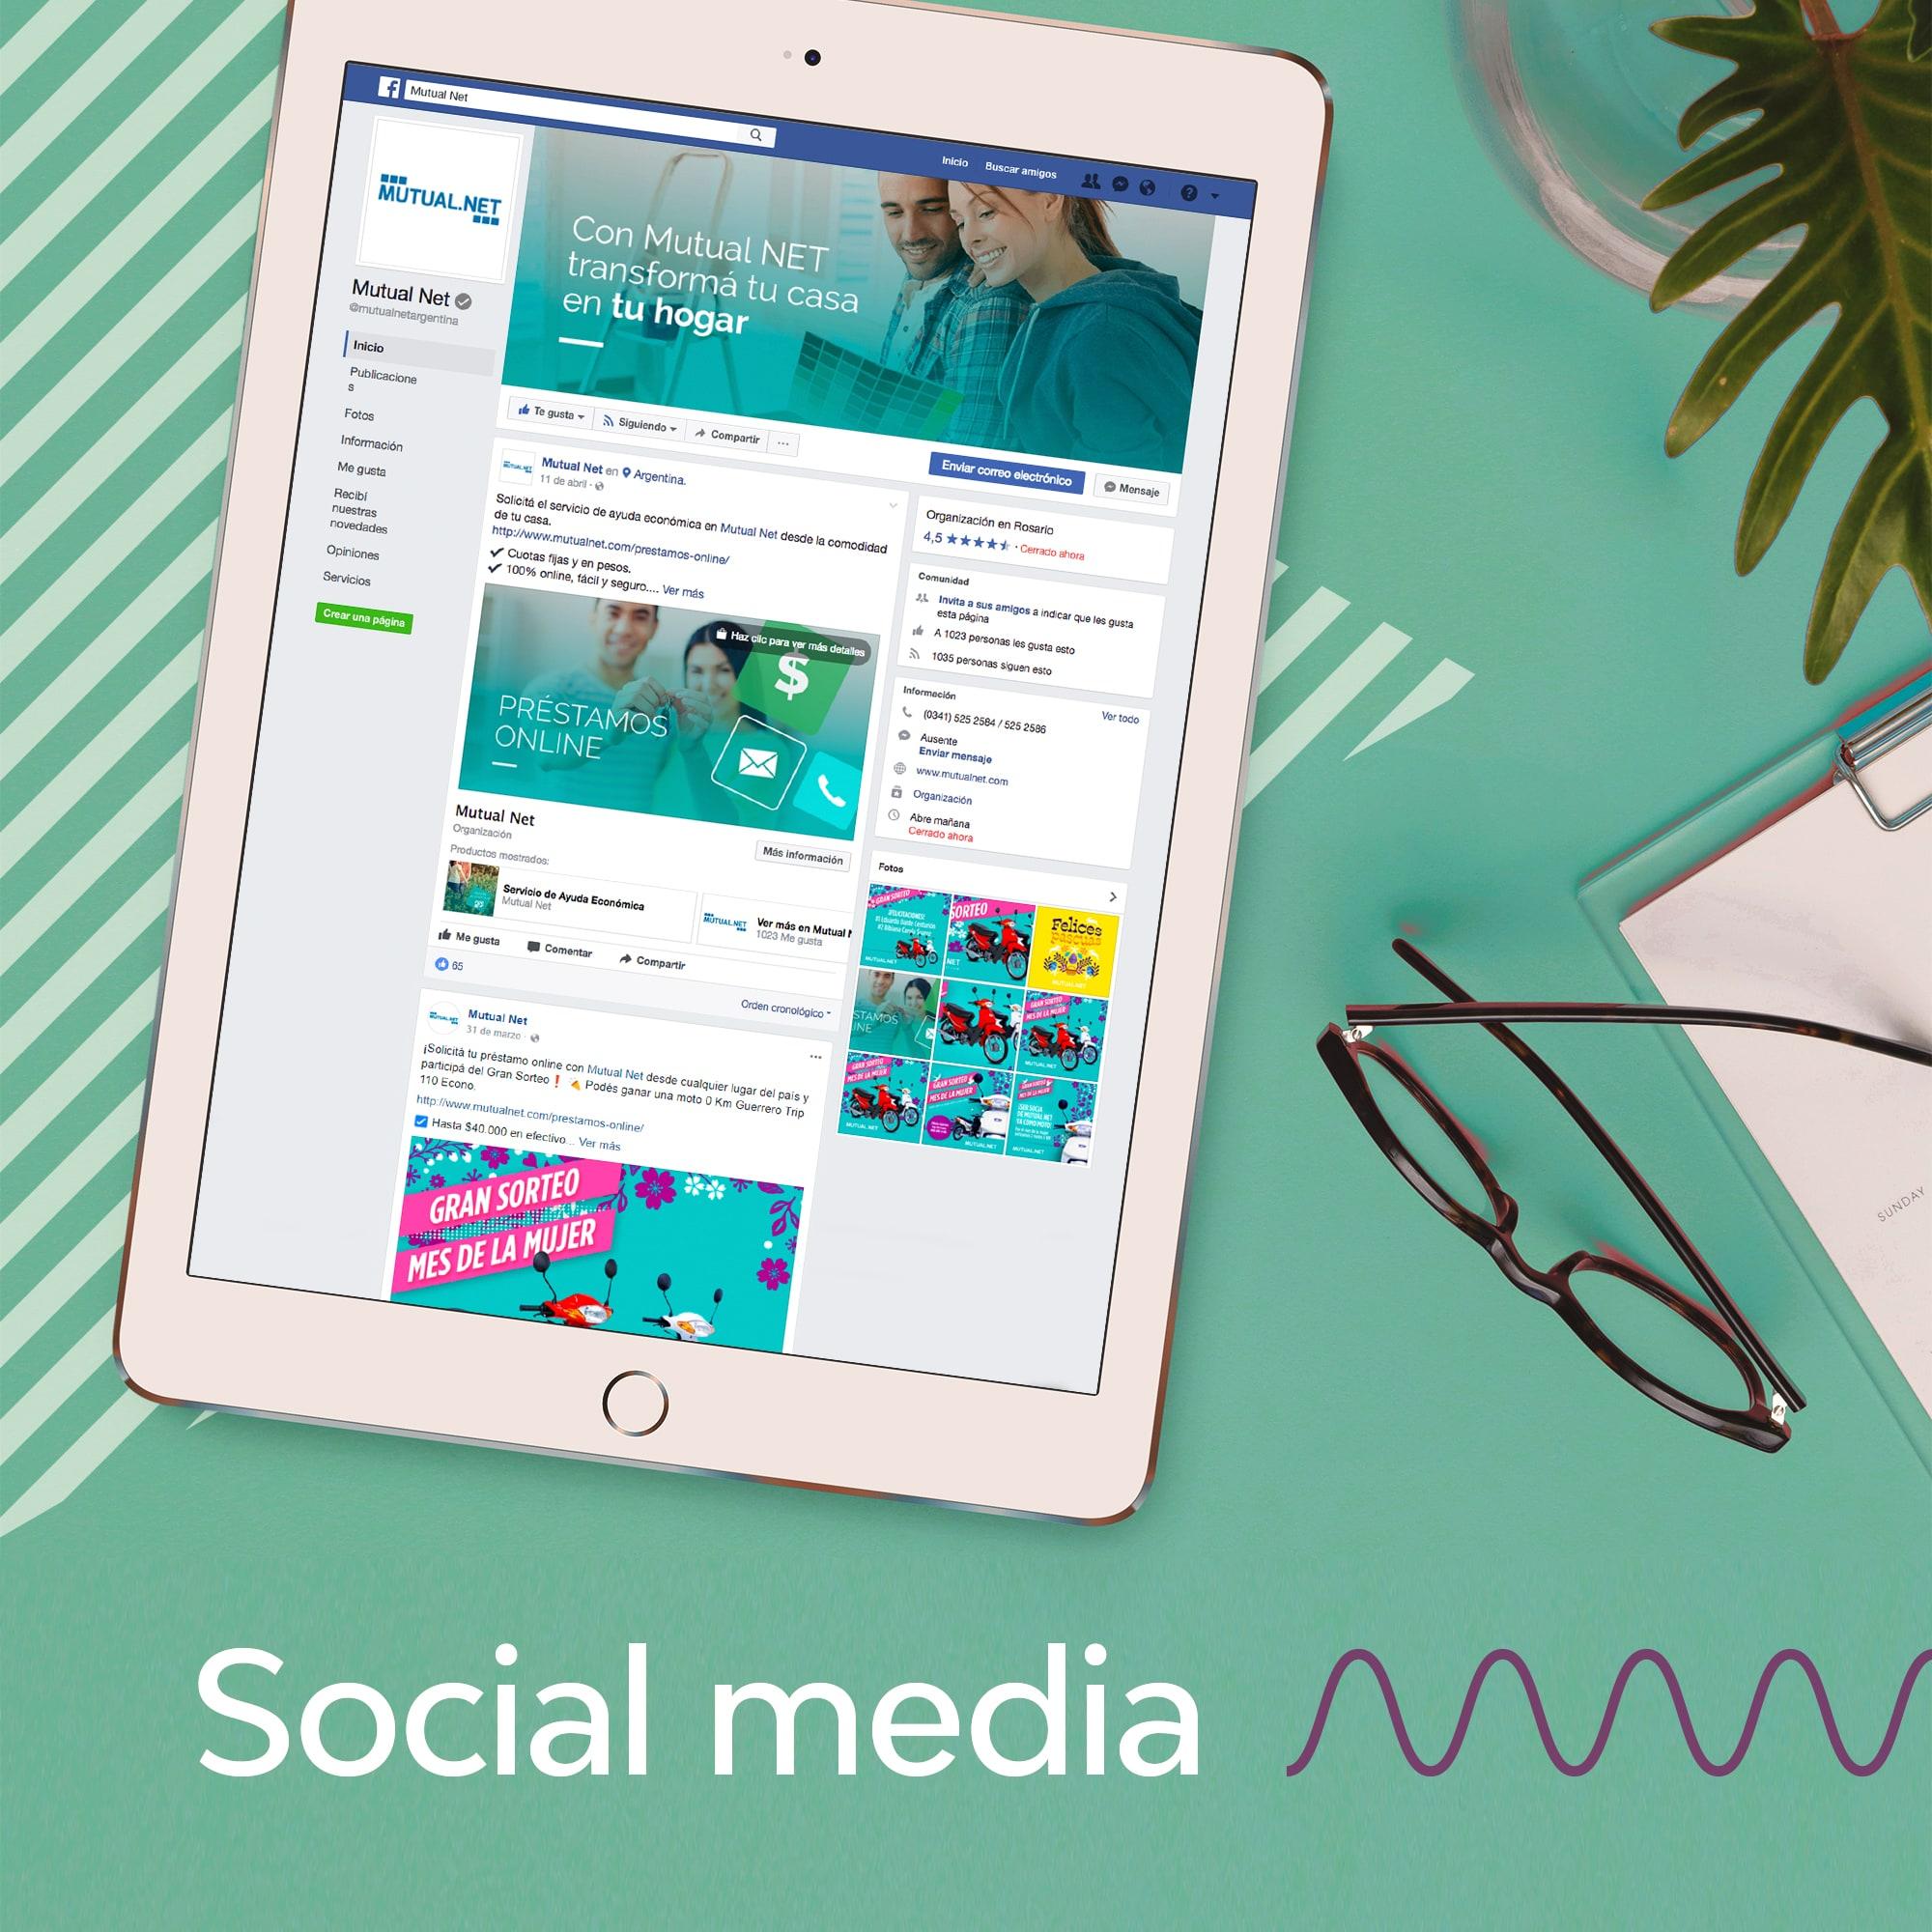 kaiserclick-social-media-ok